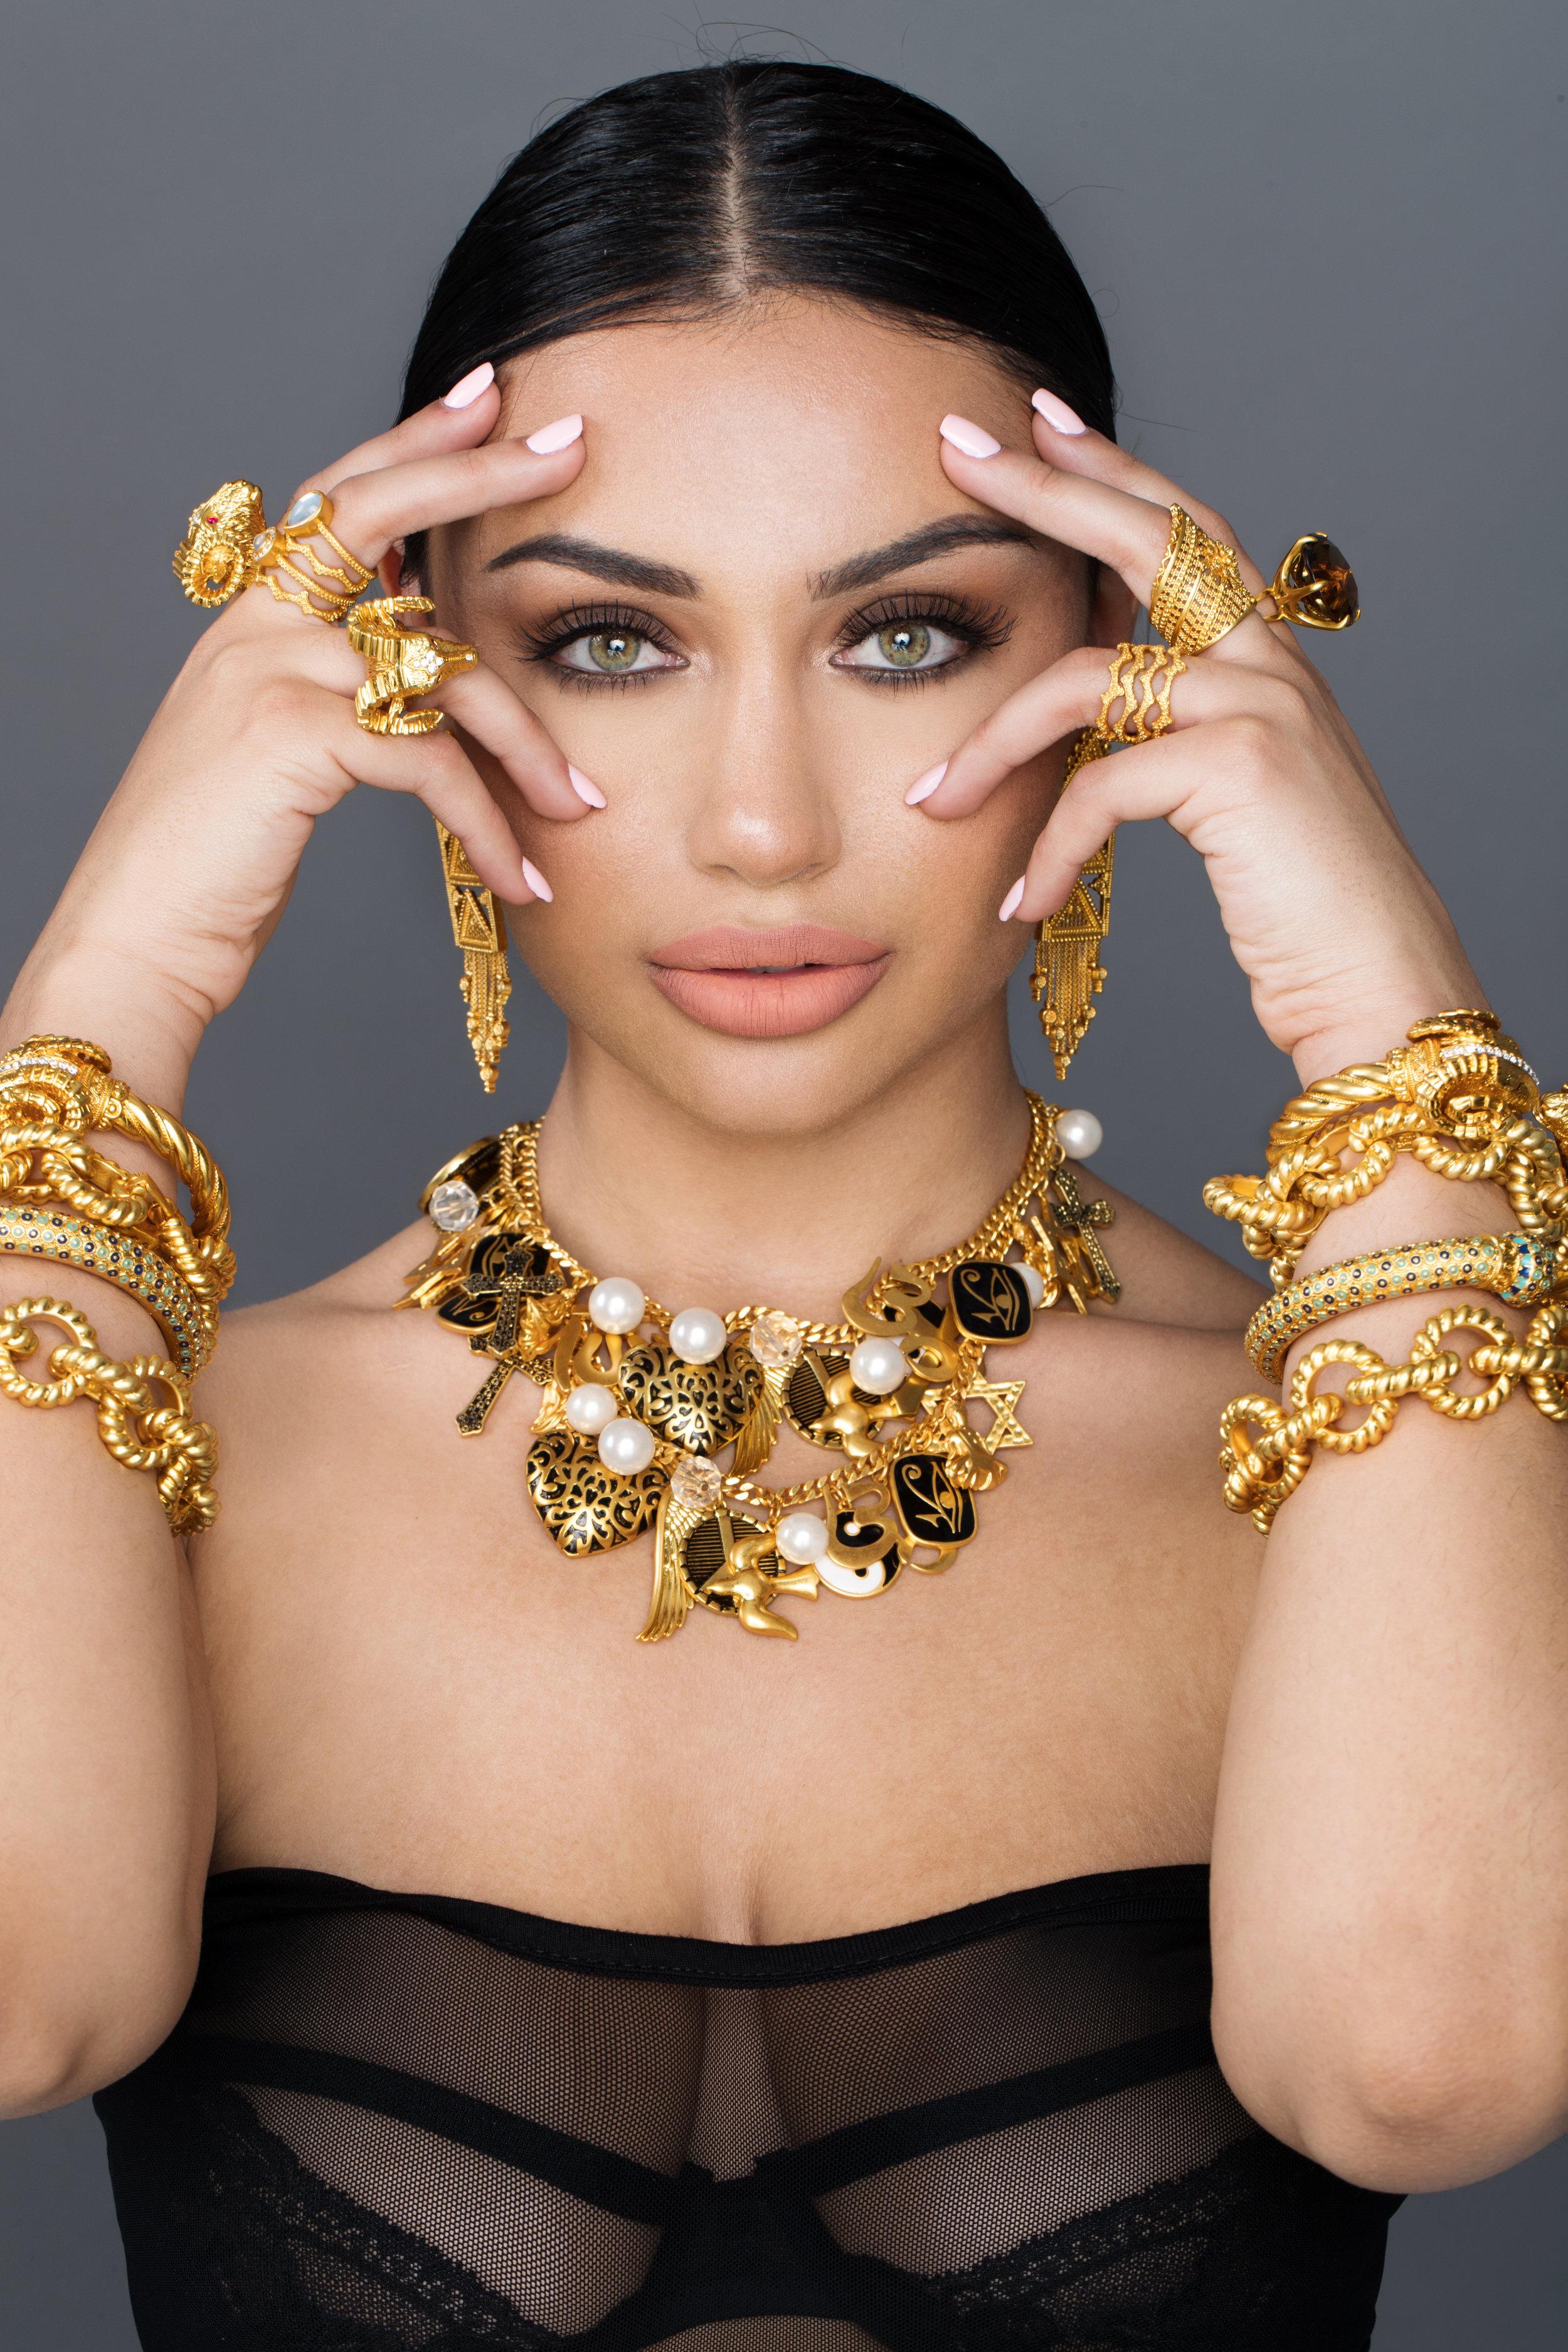 Jeweler On Shahs Of Sunset : jeweler, shahs, sunset, Kaftans